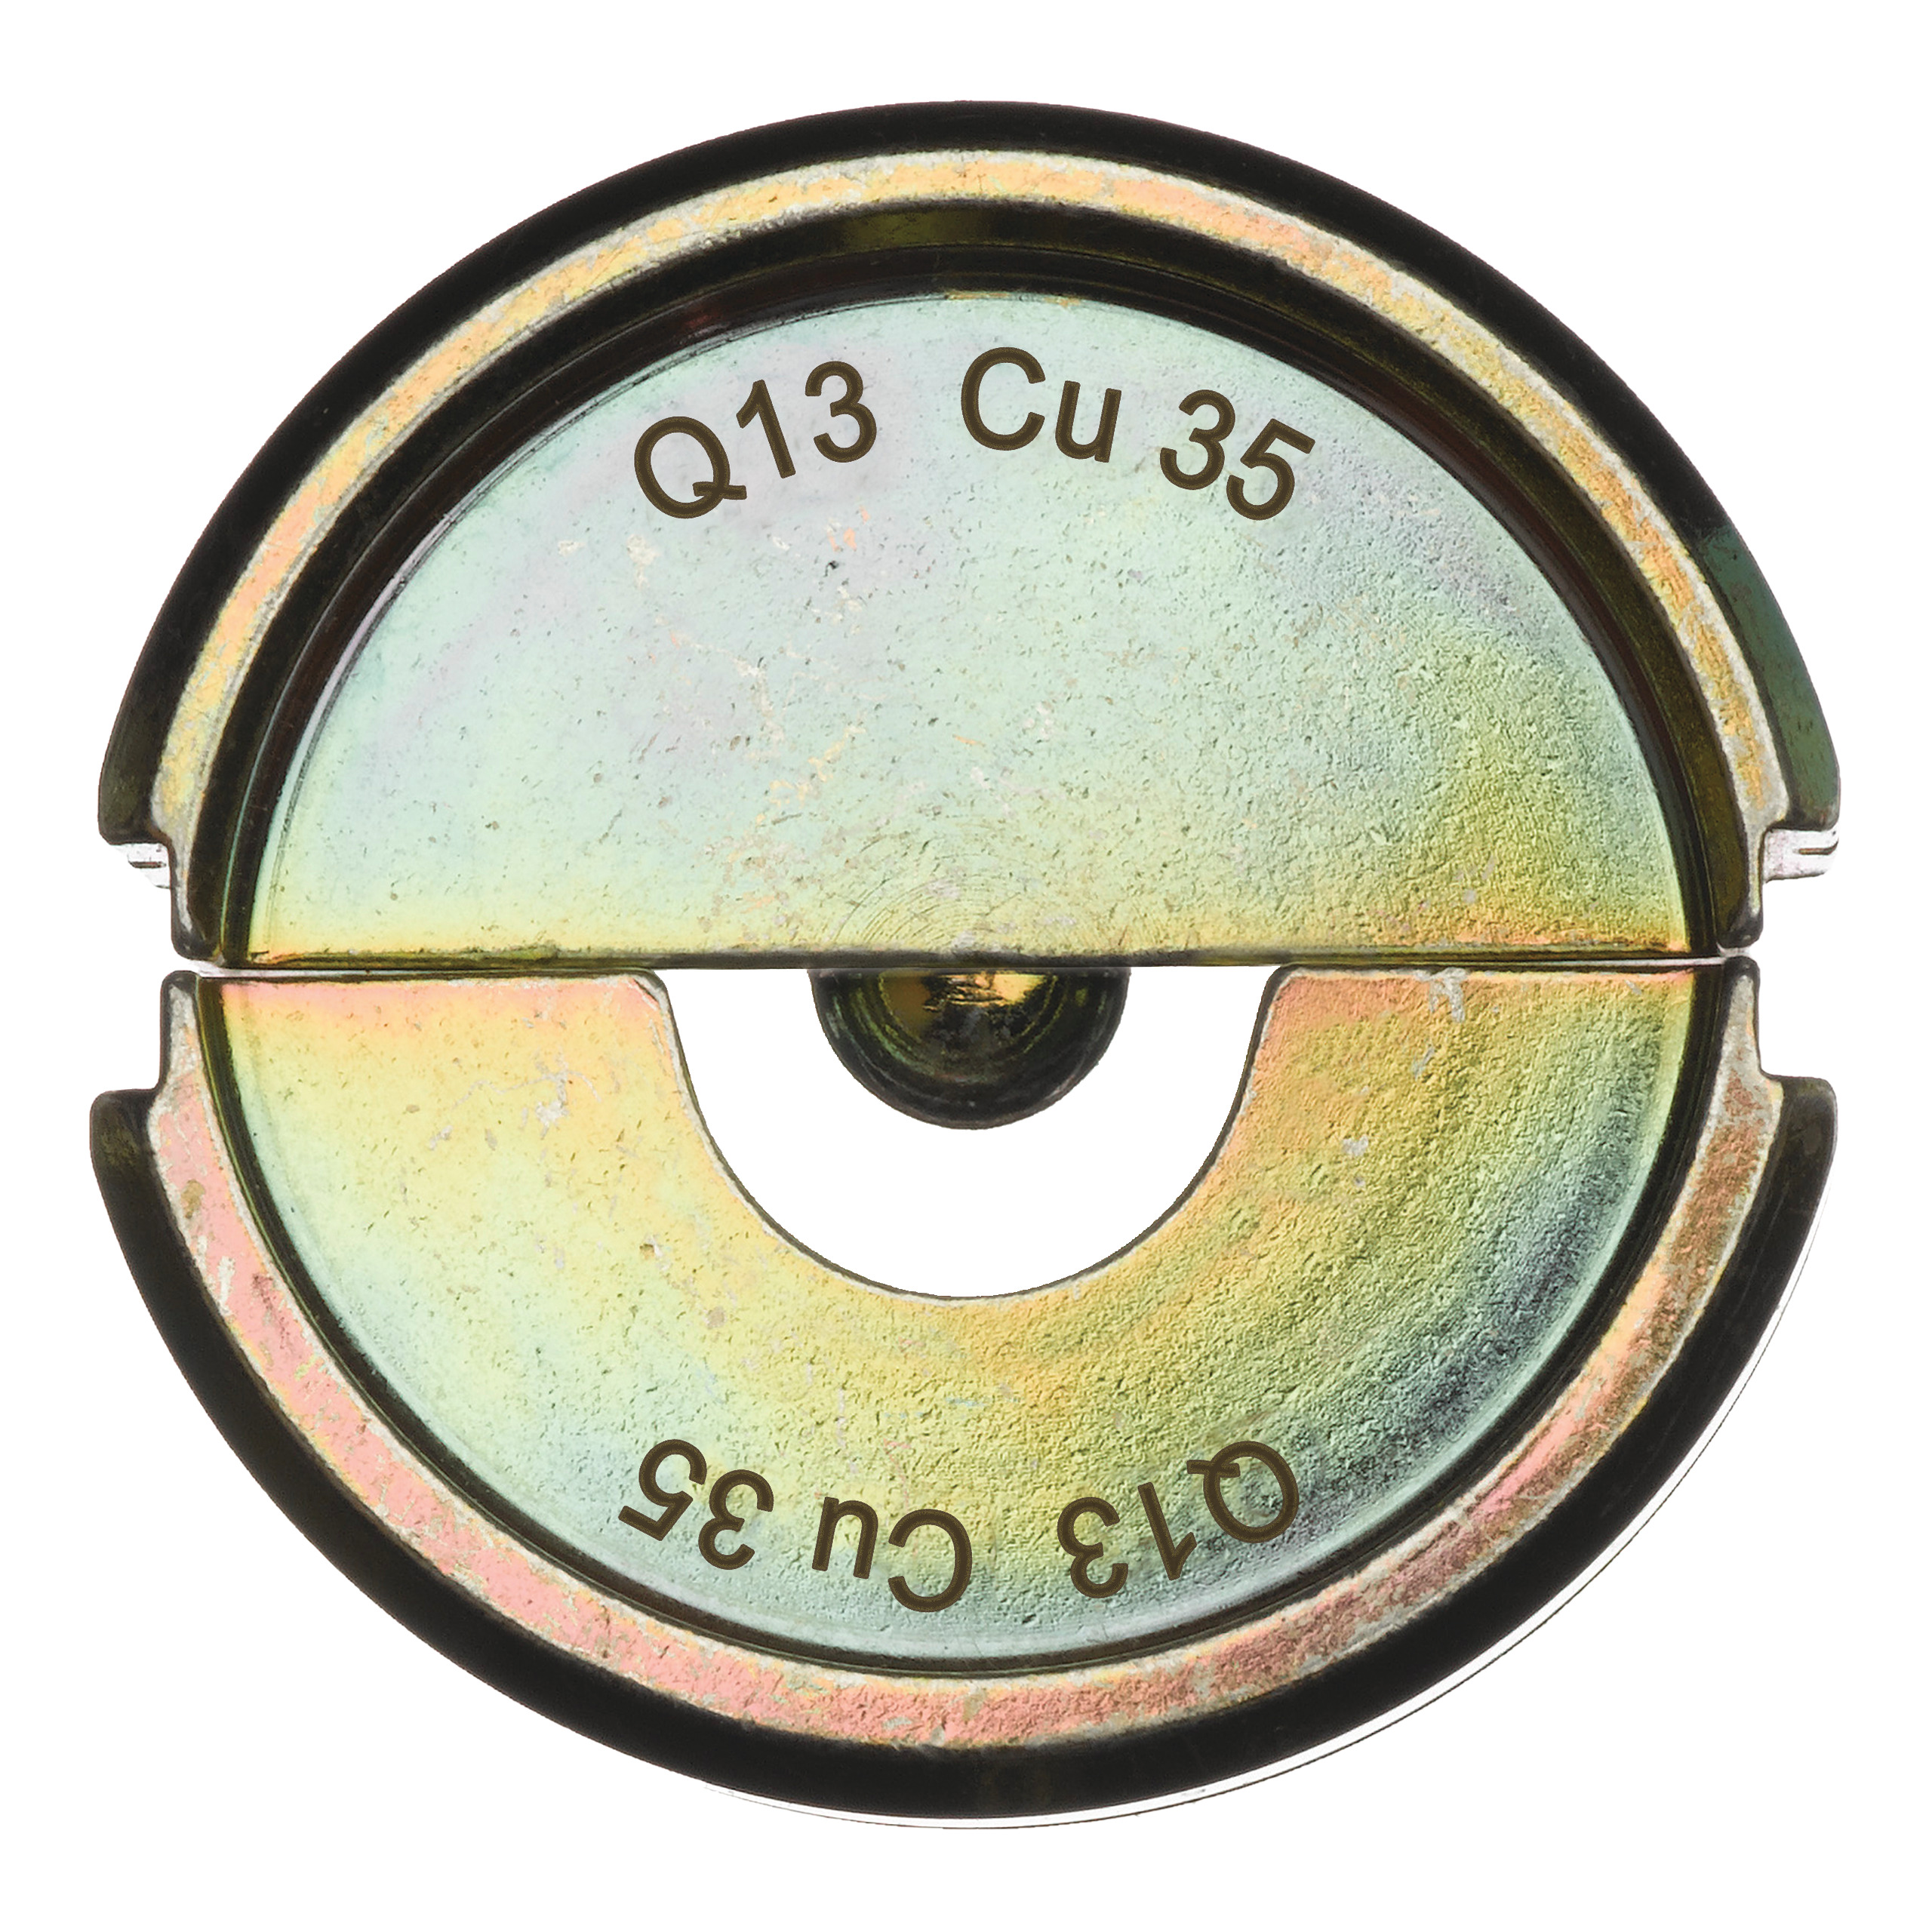 Q13 CU 35-1PC Pojistný kroužek